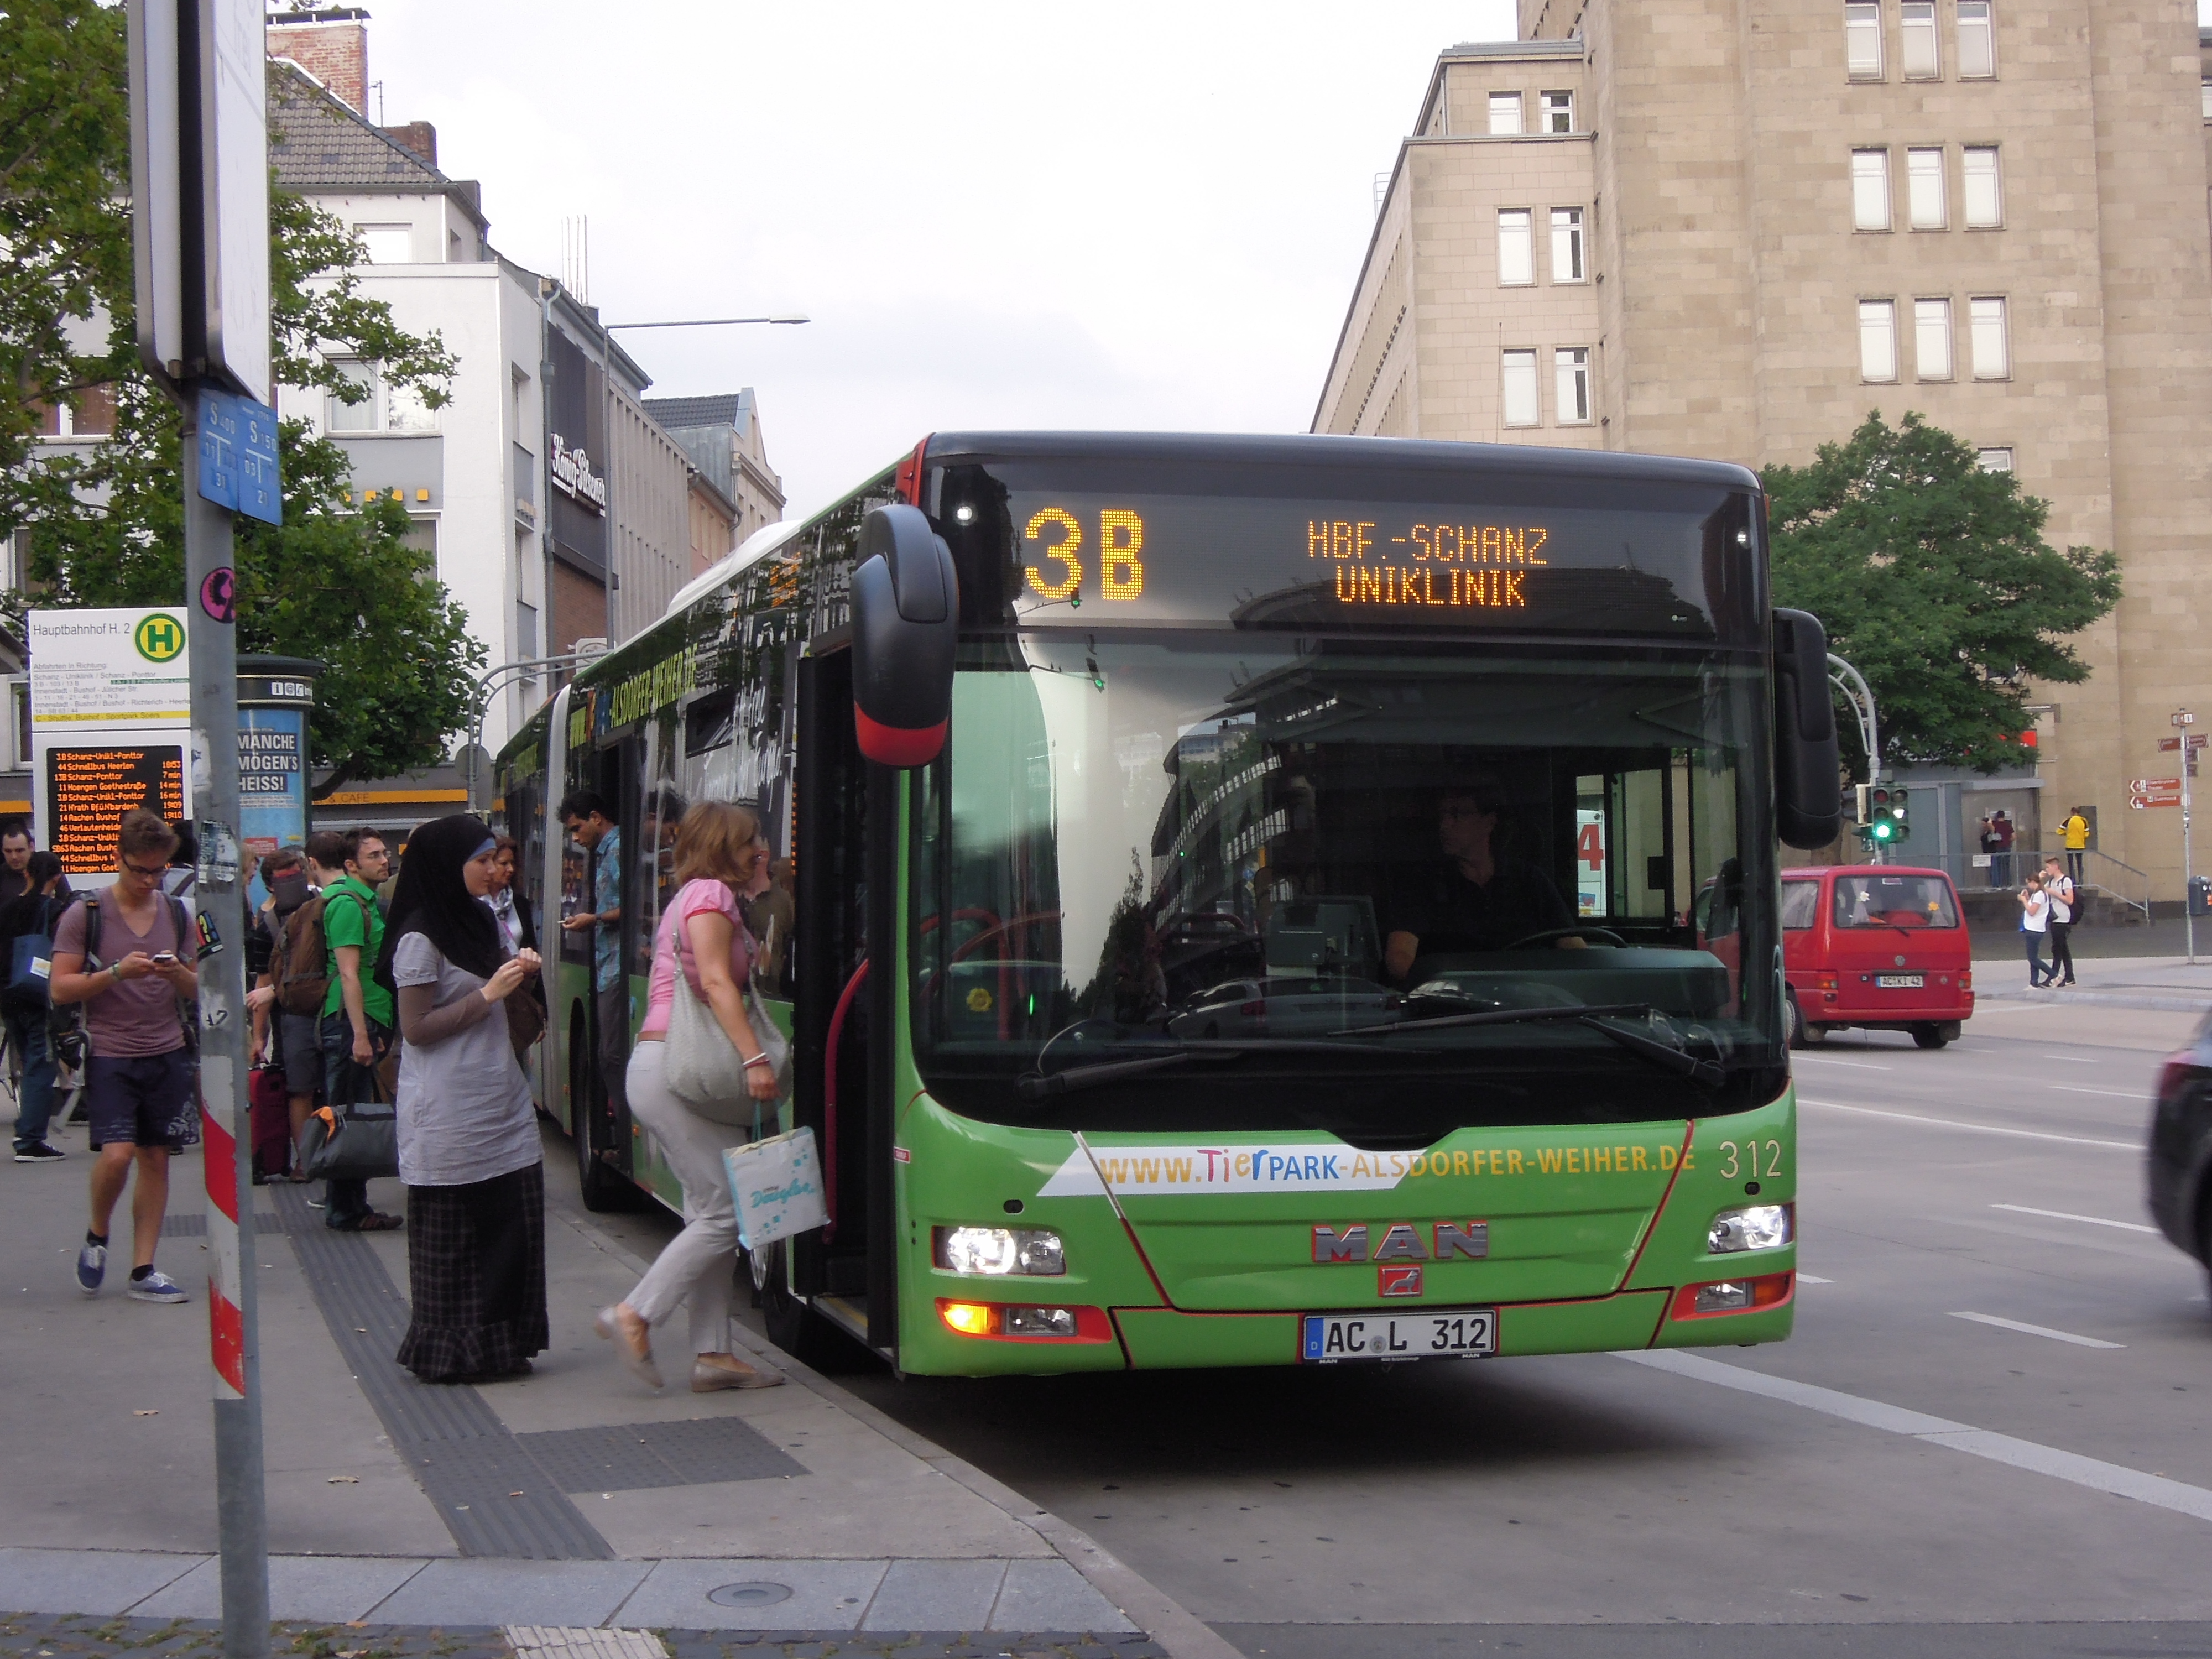 file aseag man lion 39 s city g tierpark vollwerbung aachen hauptbahnhof bus 07 2014 3. Black Bedroom Furniture Sets. Home Design Ideas